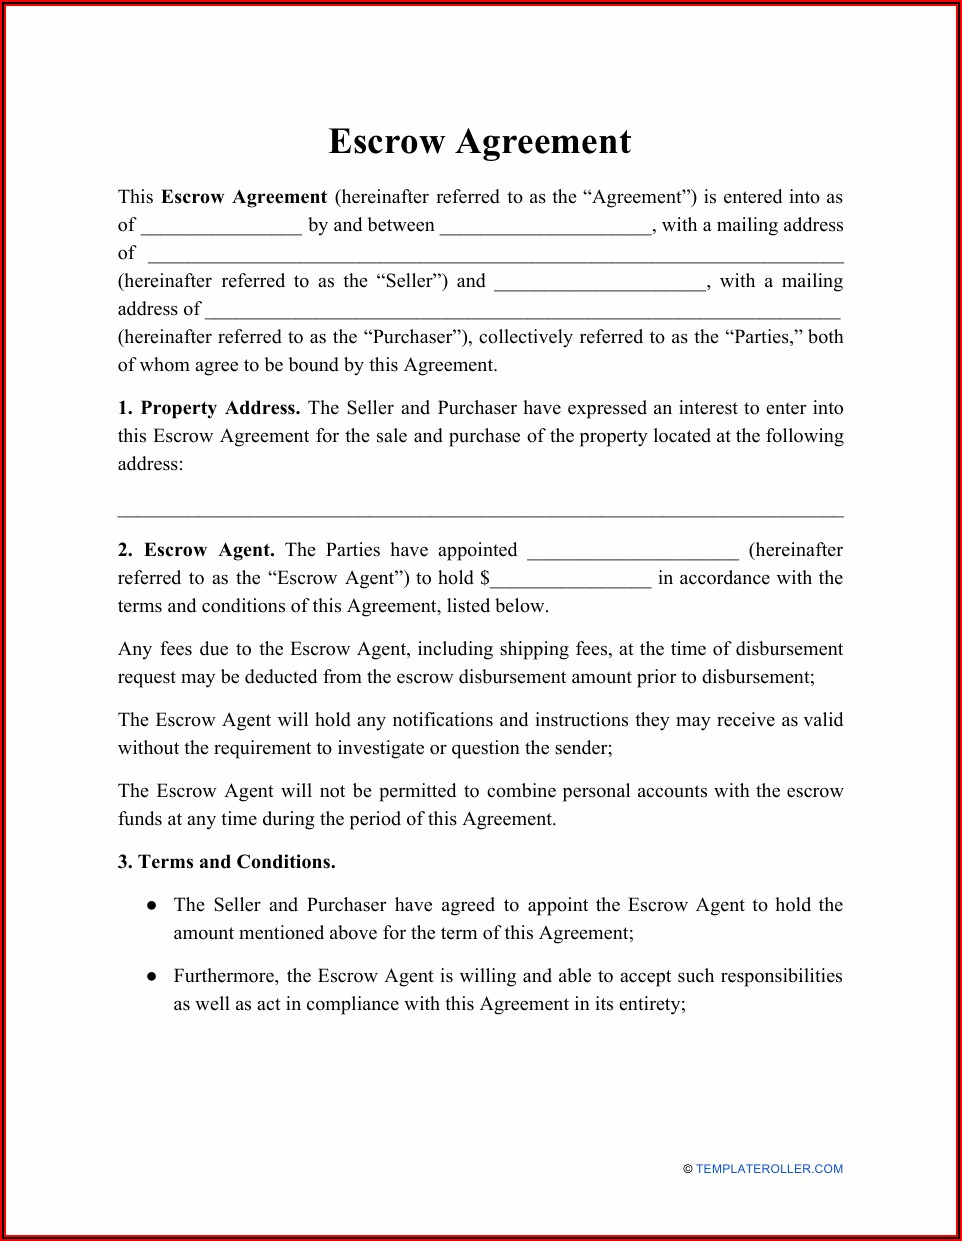 Escrow Agreement Template Pdf